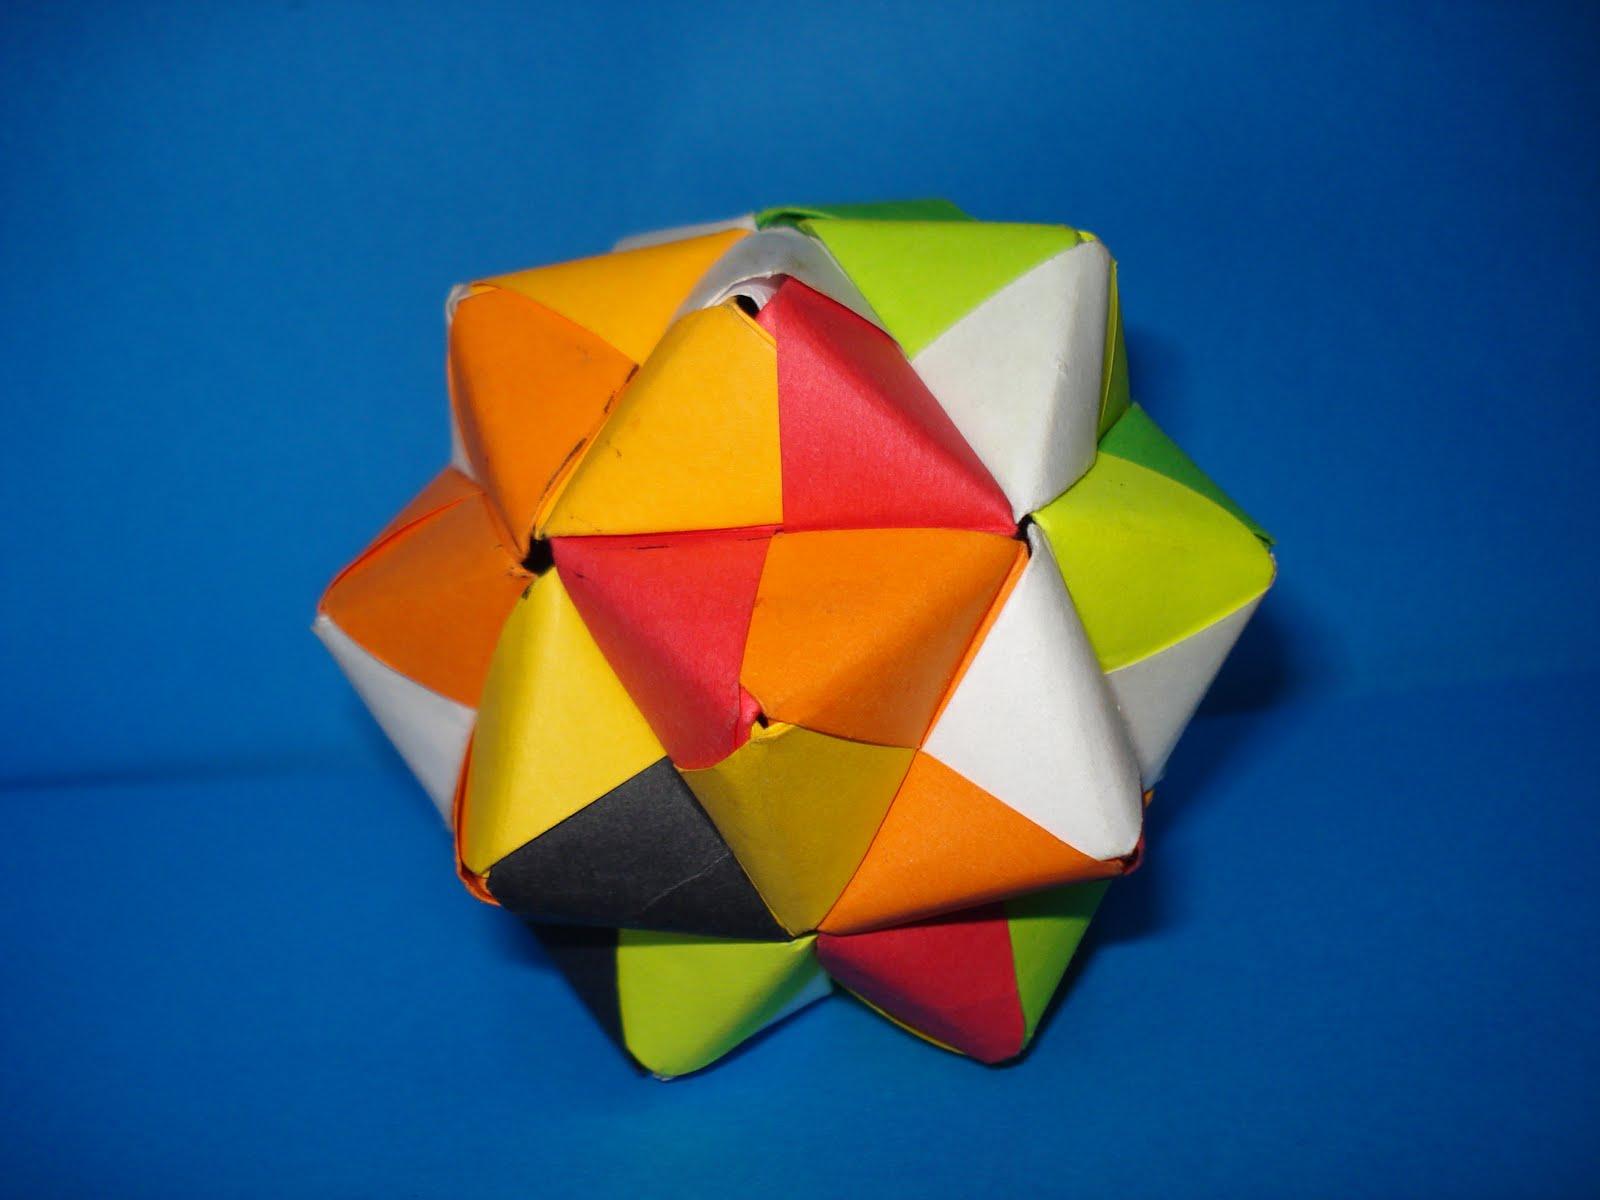 Origamijwm septiembre 2010 - Origami de una estrella ...